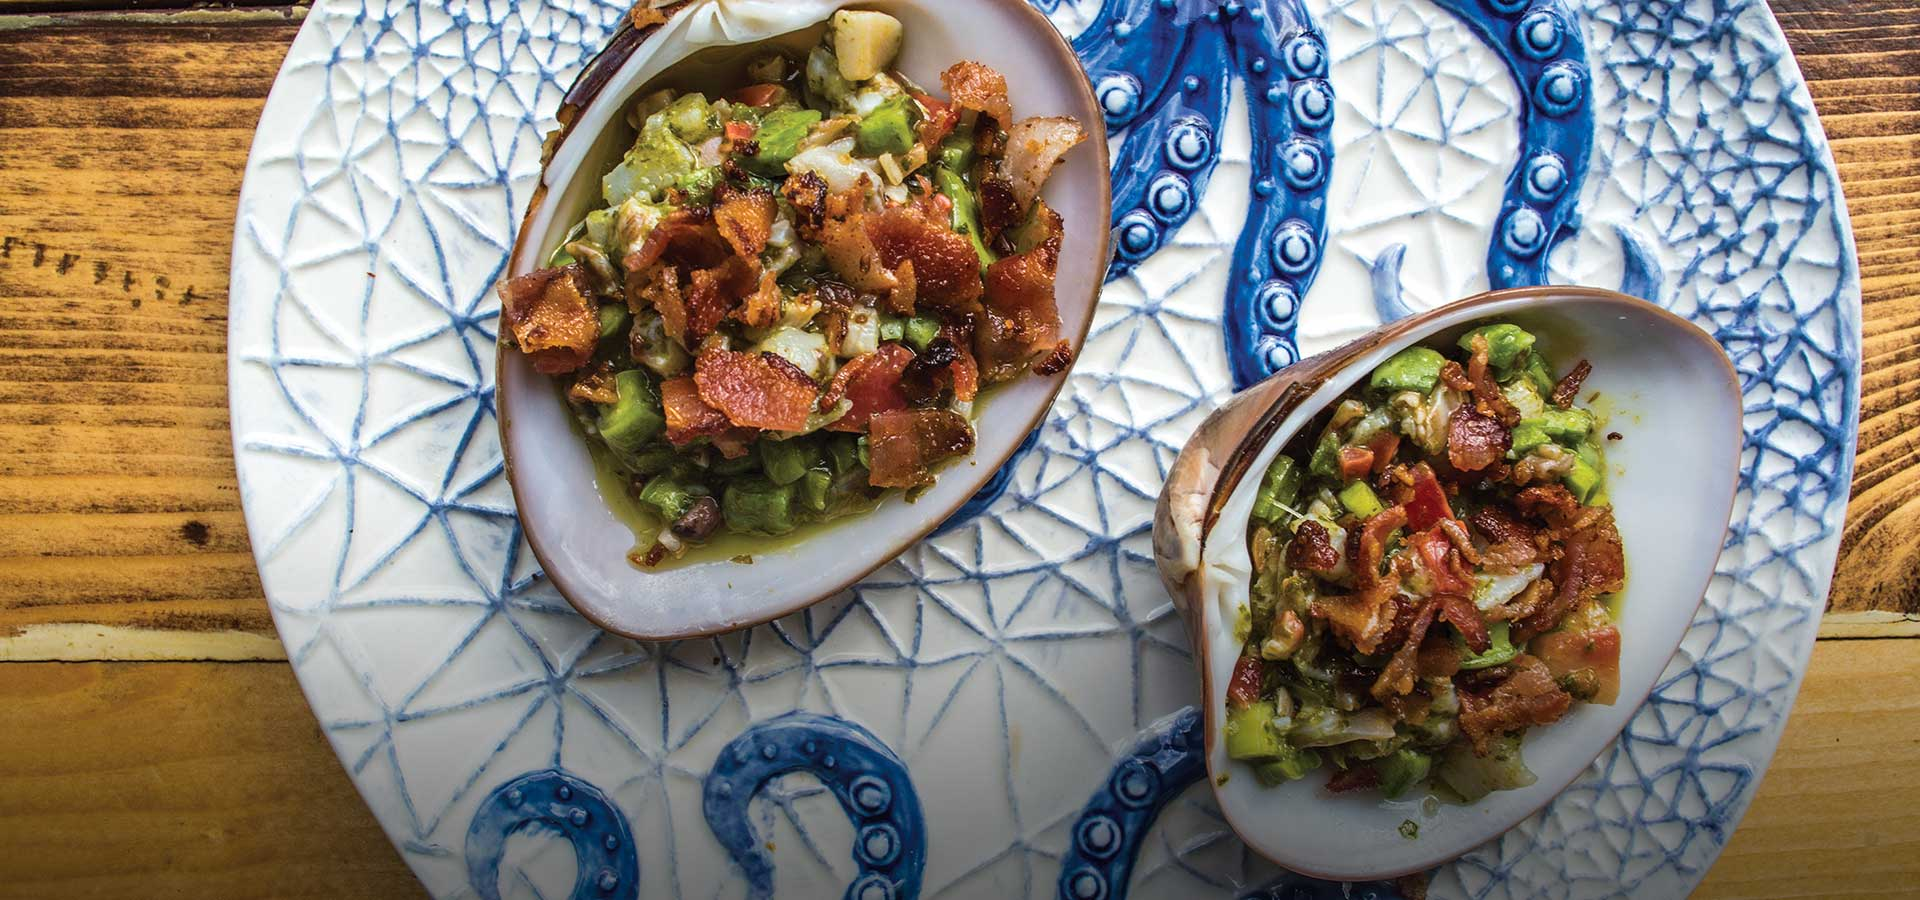 Ensenada Gastronomia Baja California